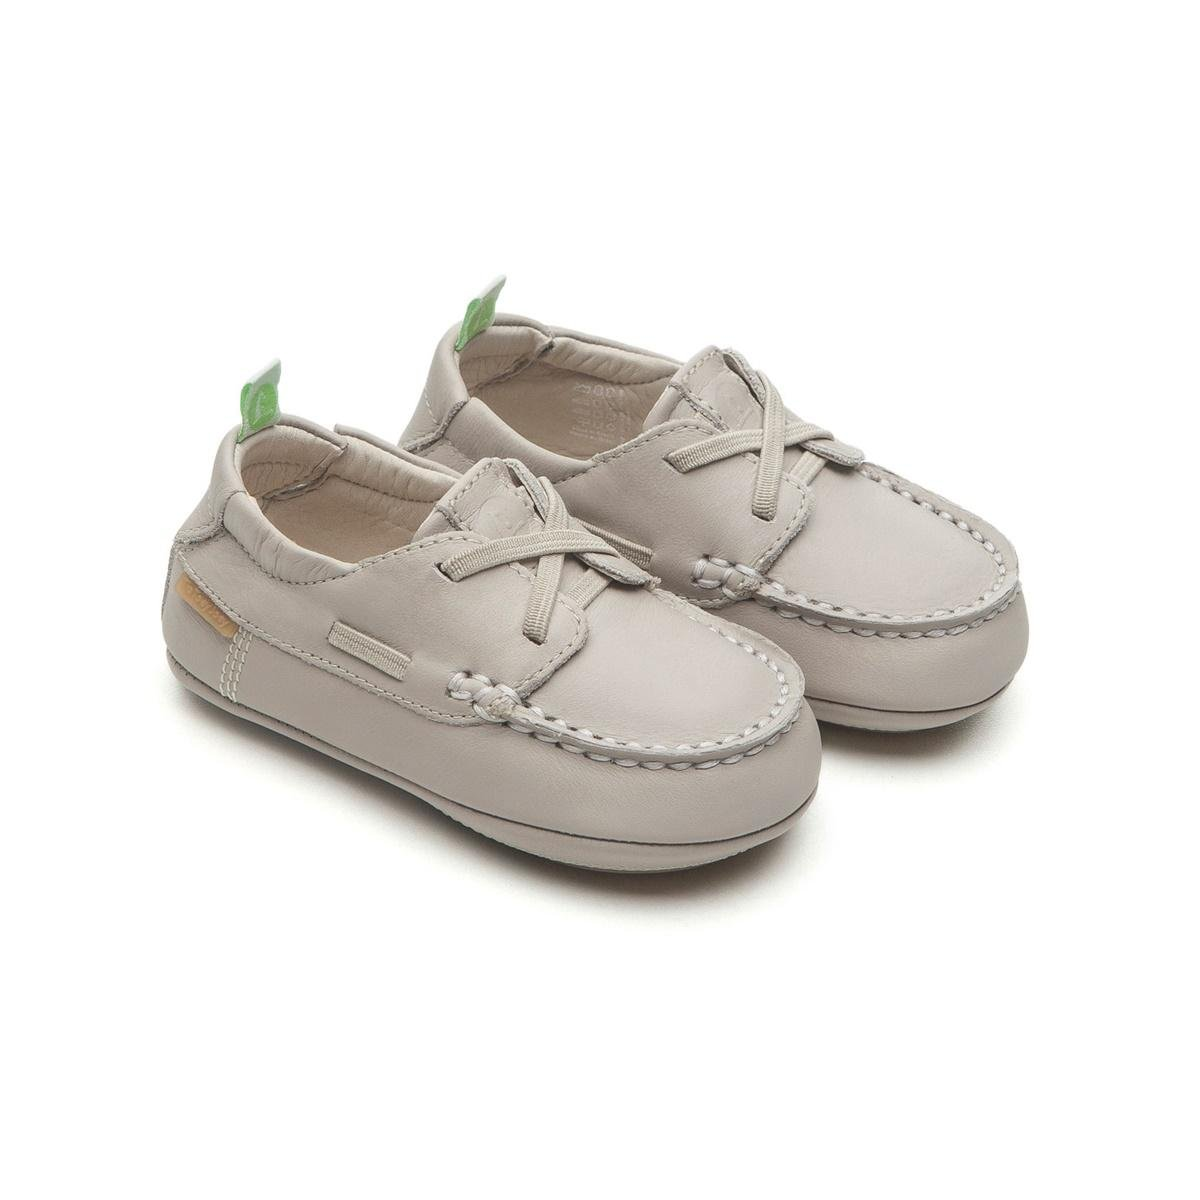 3c08c5b57b Mocassim Infantil Tip Toey Joey Boaty - Compre Agora